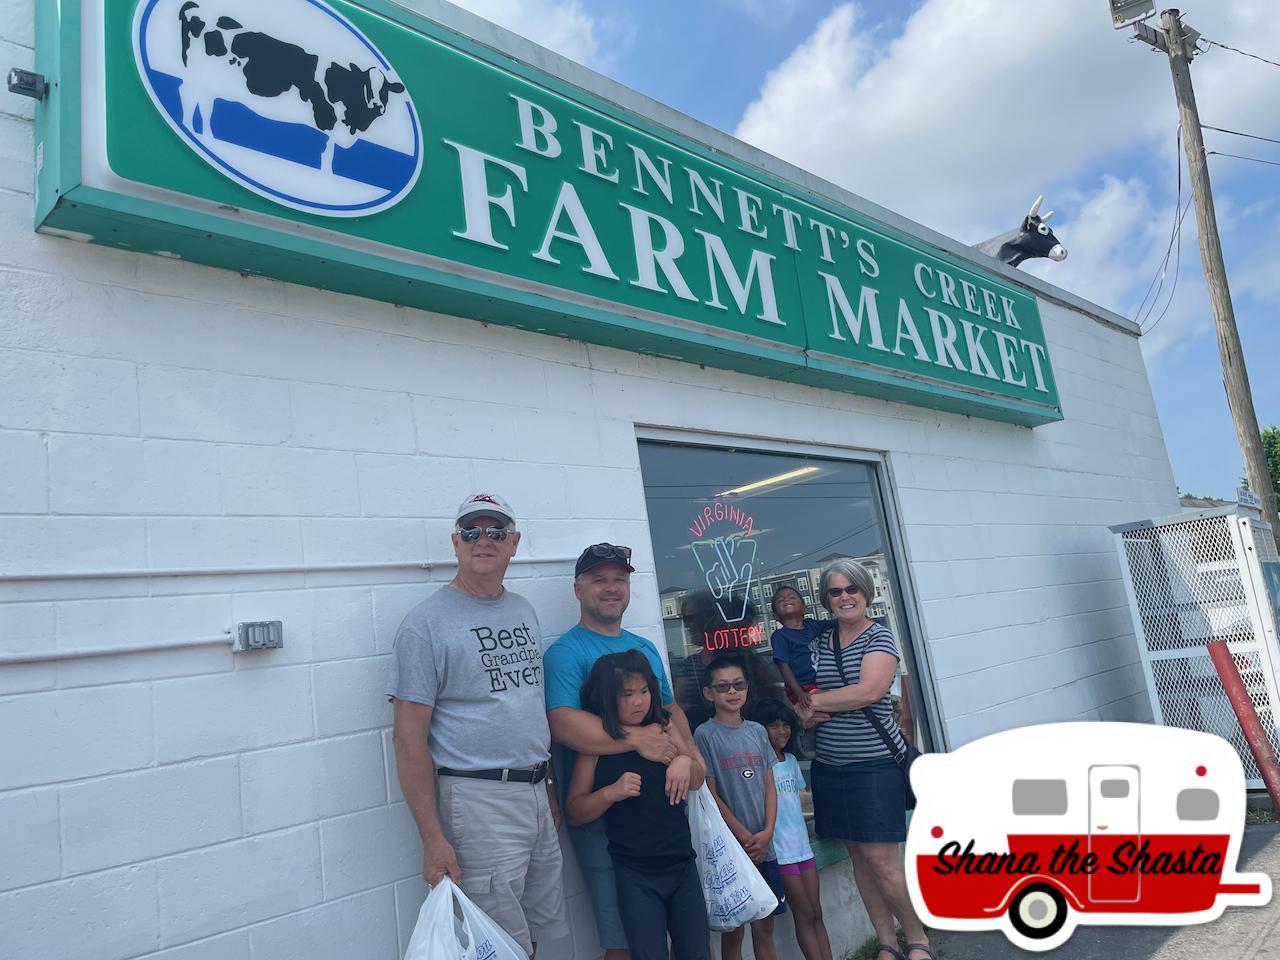 Bennett-at-Bennetts-Creek-Farm-Market